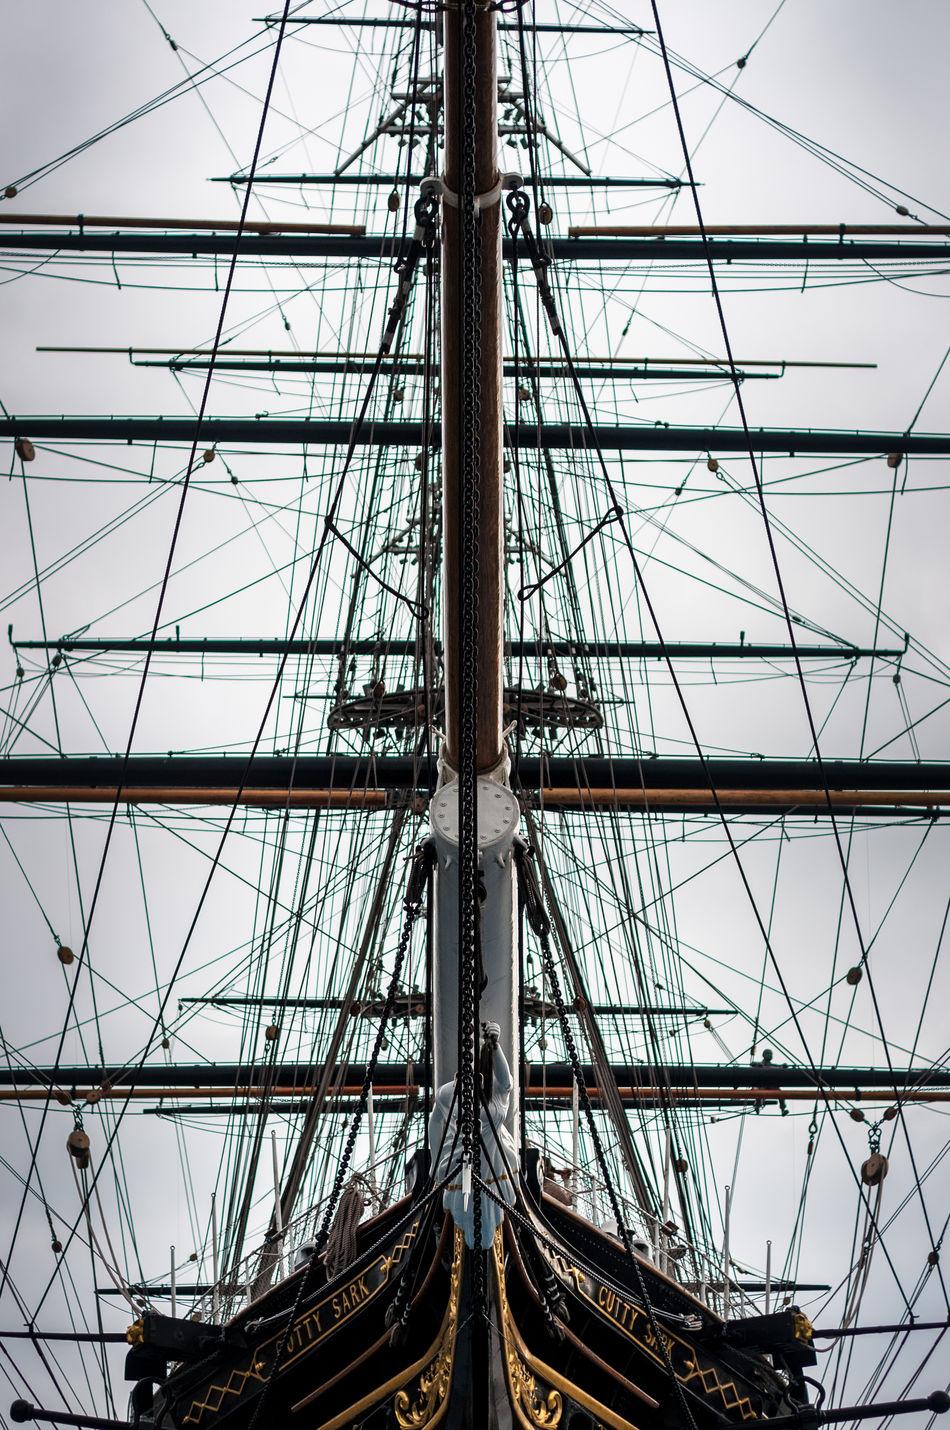 Boat Fregate Cutty Sark Greenwich London Sail Lieblingsteil